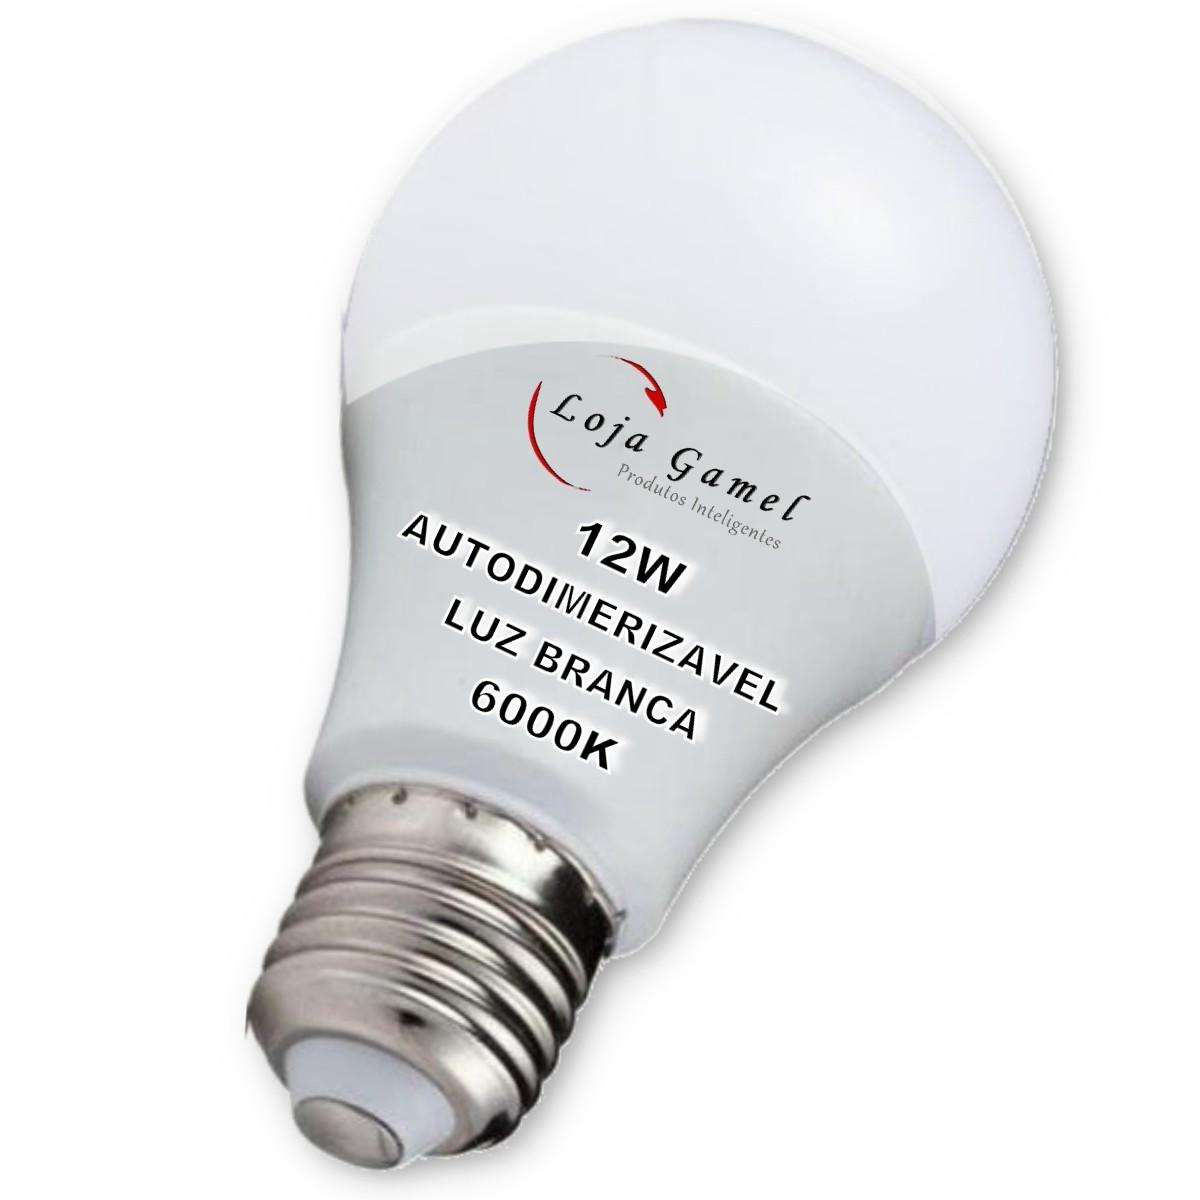 Foto4 - Lâmpada LED Bulbo Autodimerizável 12W Luz Branca 6000K Kit 5un